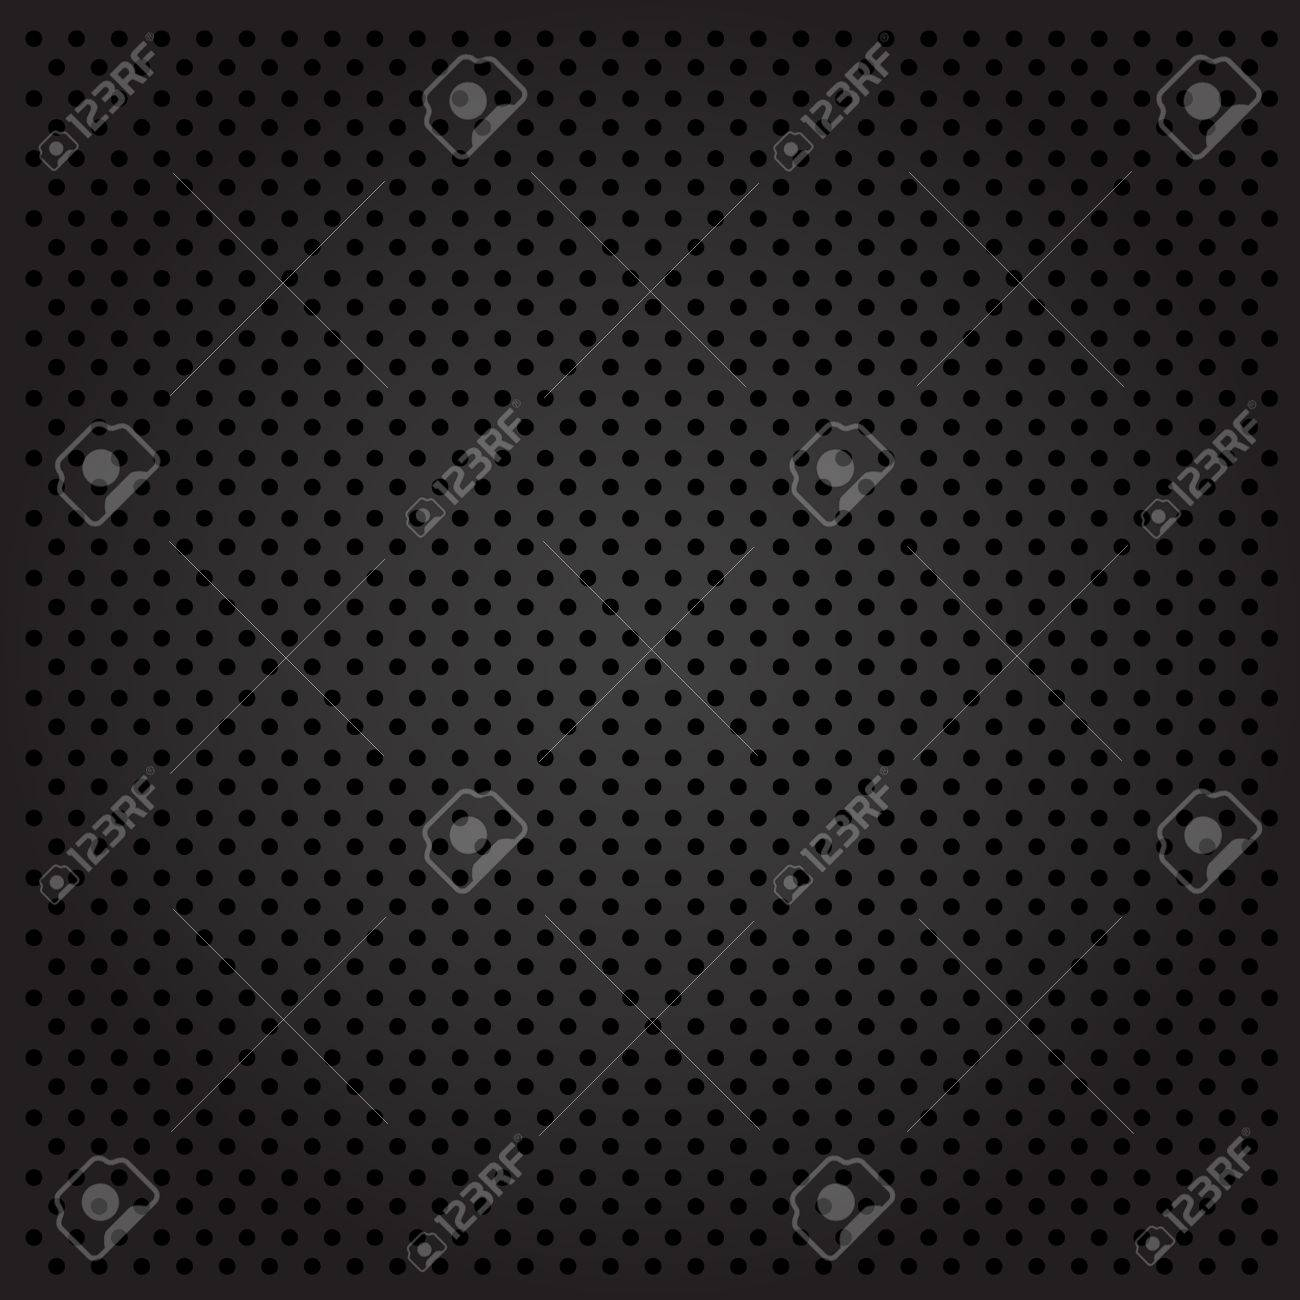 Dark metal cell background - 41710110